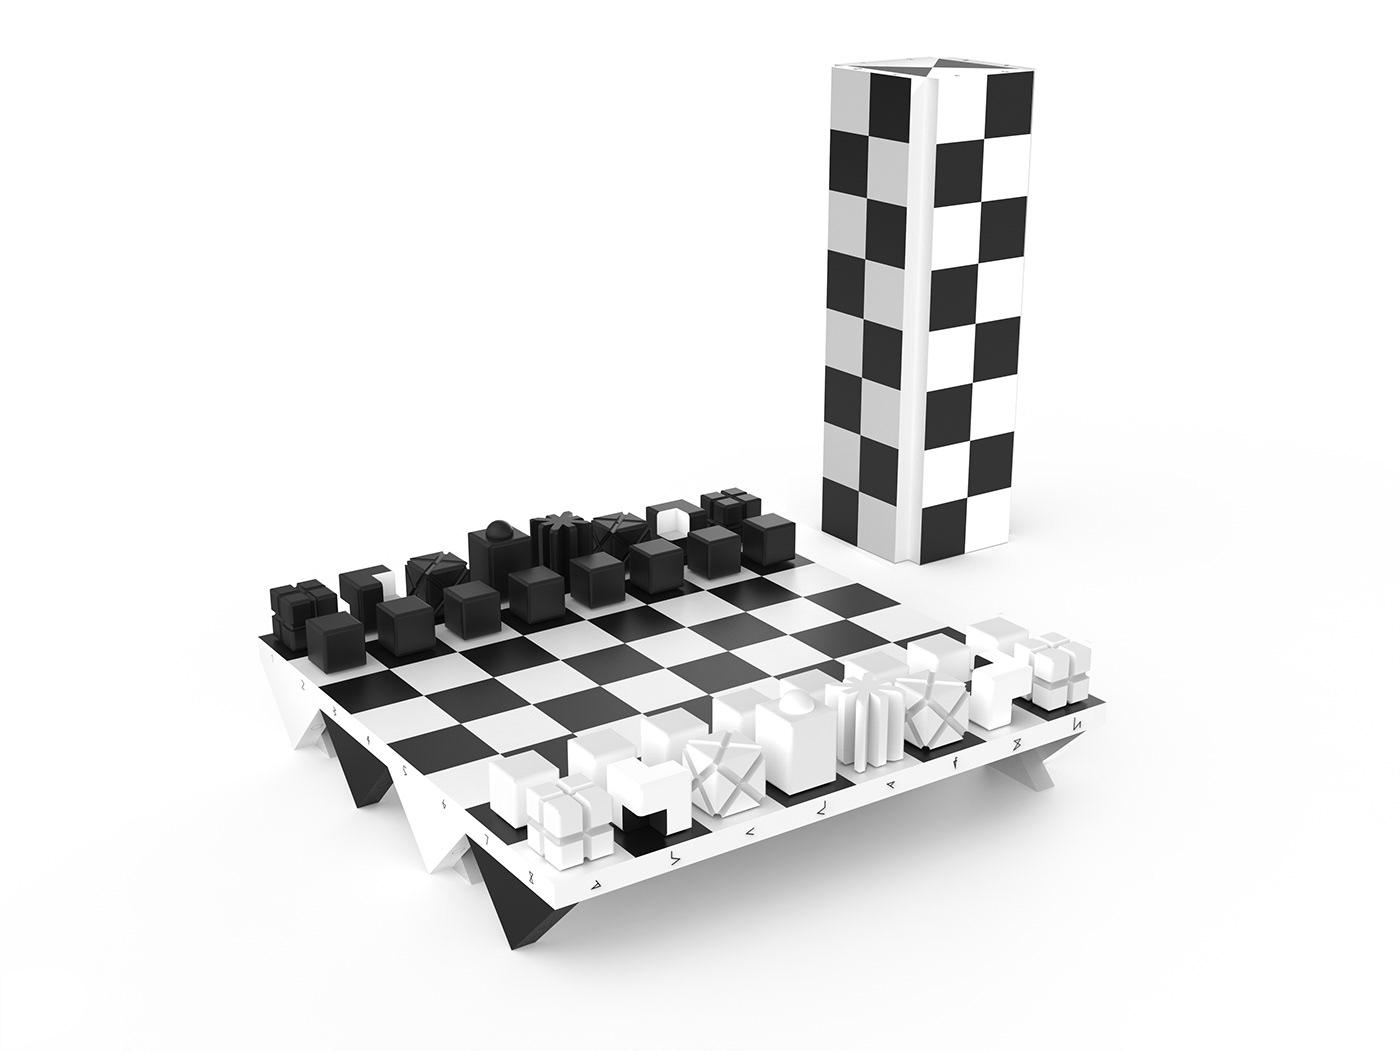 Victor chess innovative chess darko nikolic design innovative chess figures innovative chess set cubical chess